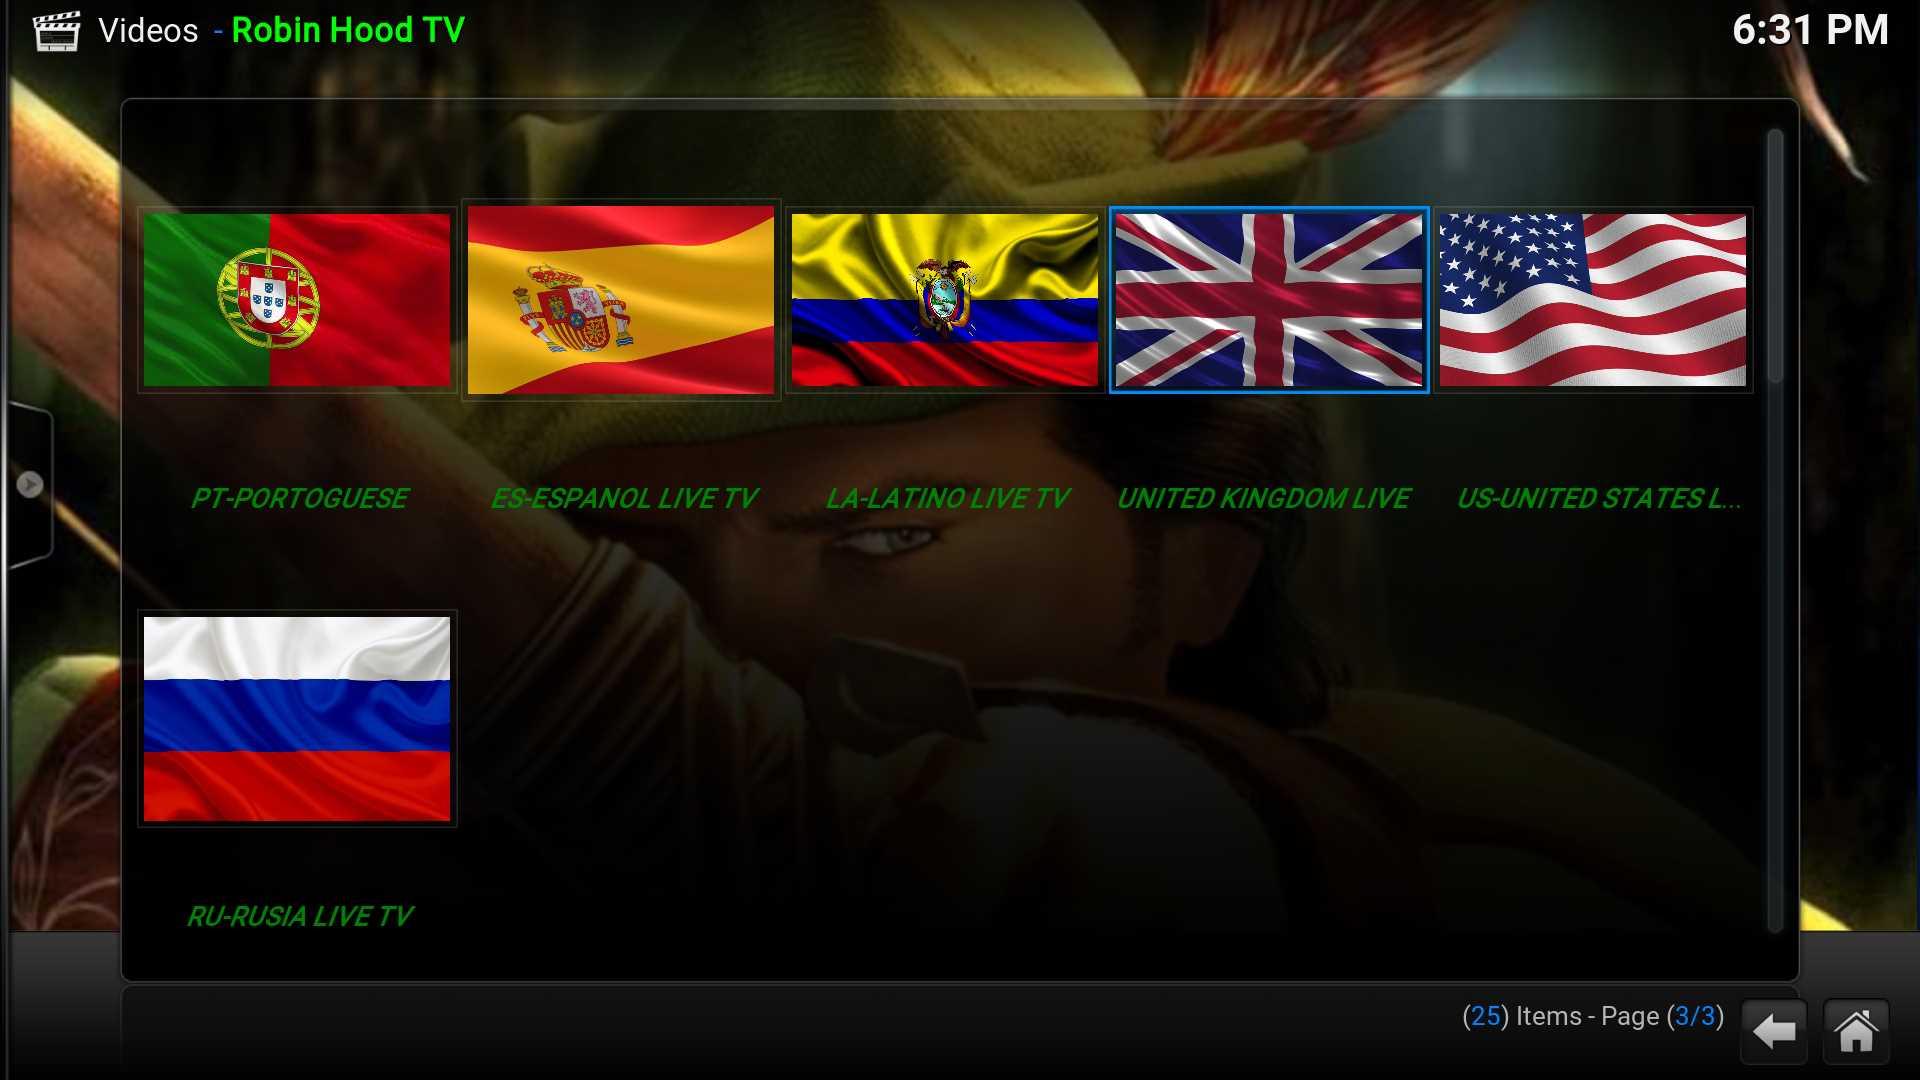 How to install Robin Hood Tv Kodi addon | Kodiapps